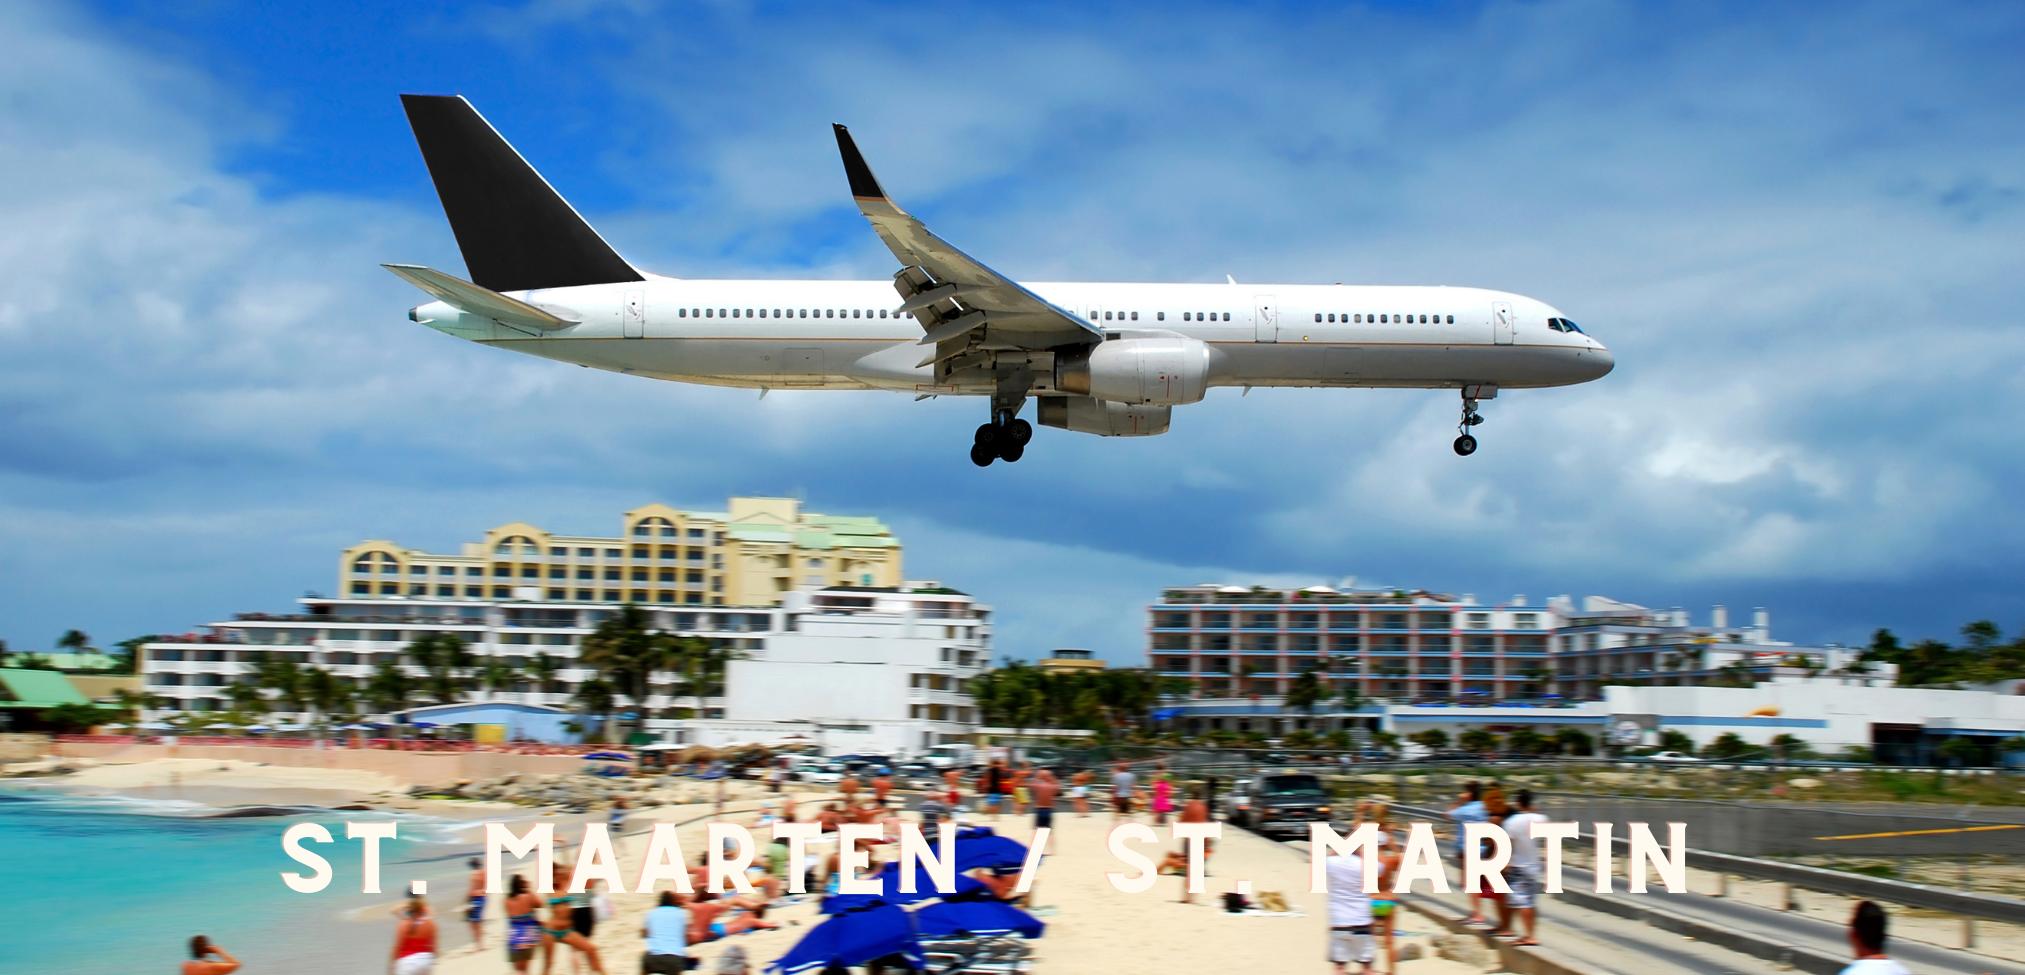 Urlaub Karibik St. Maarten